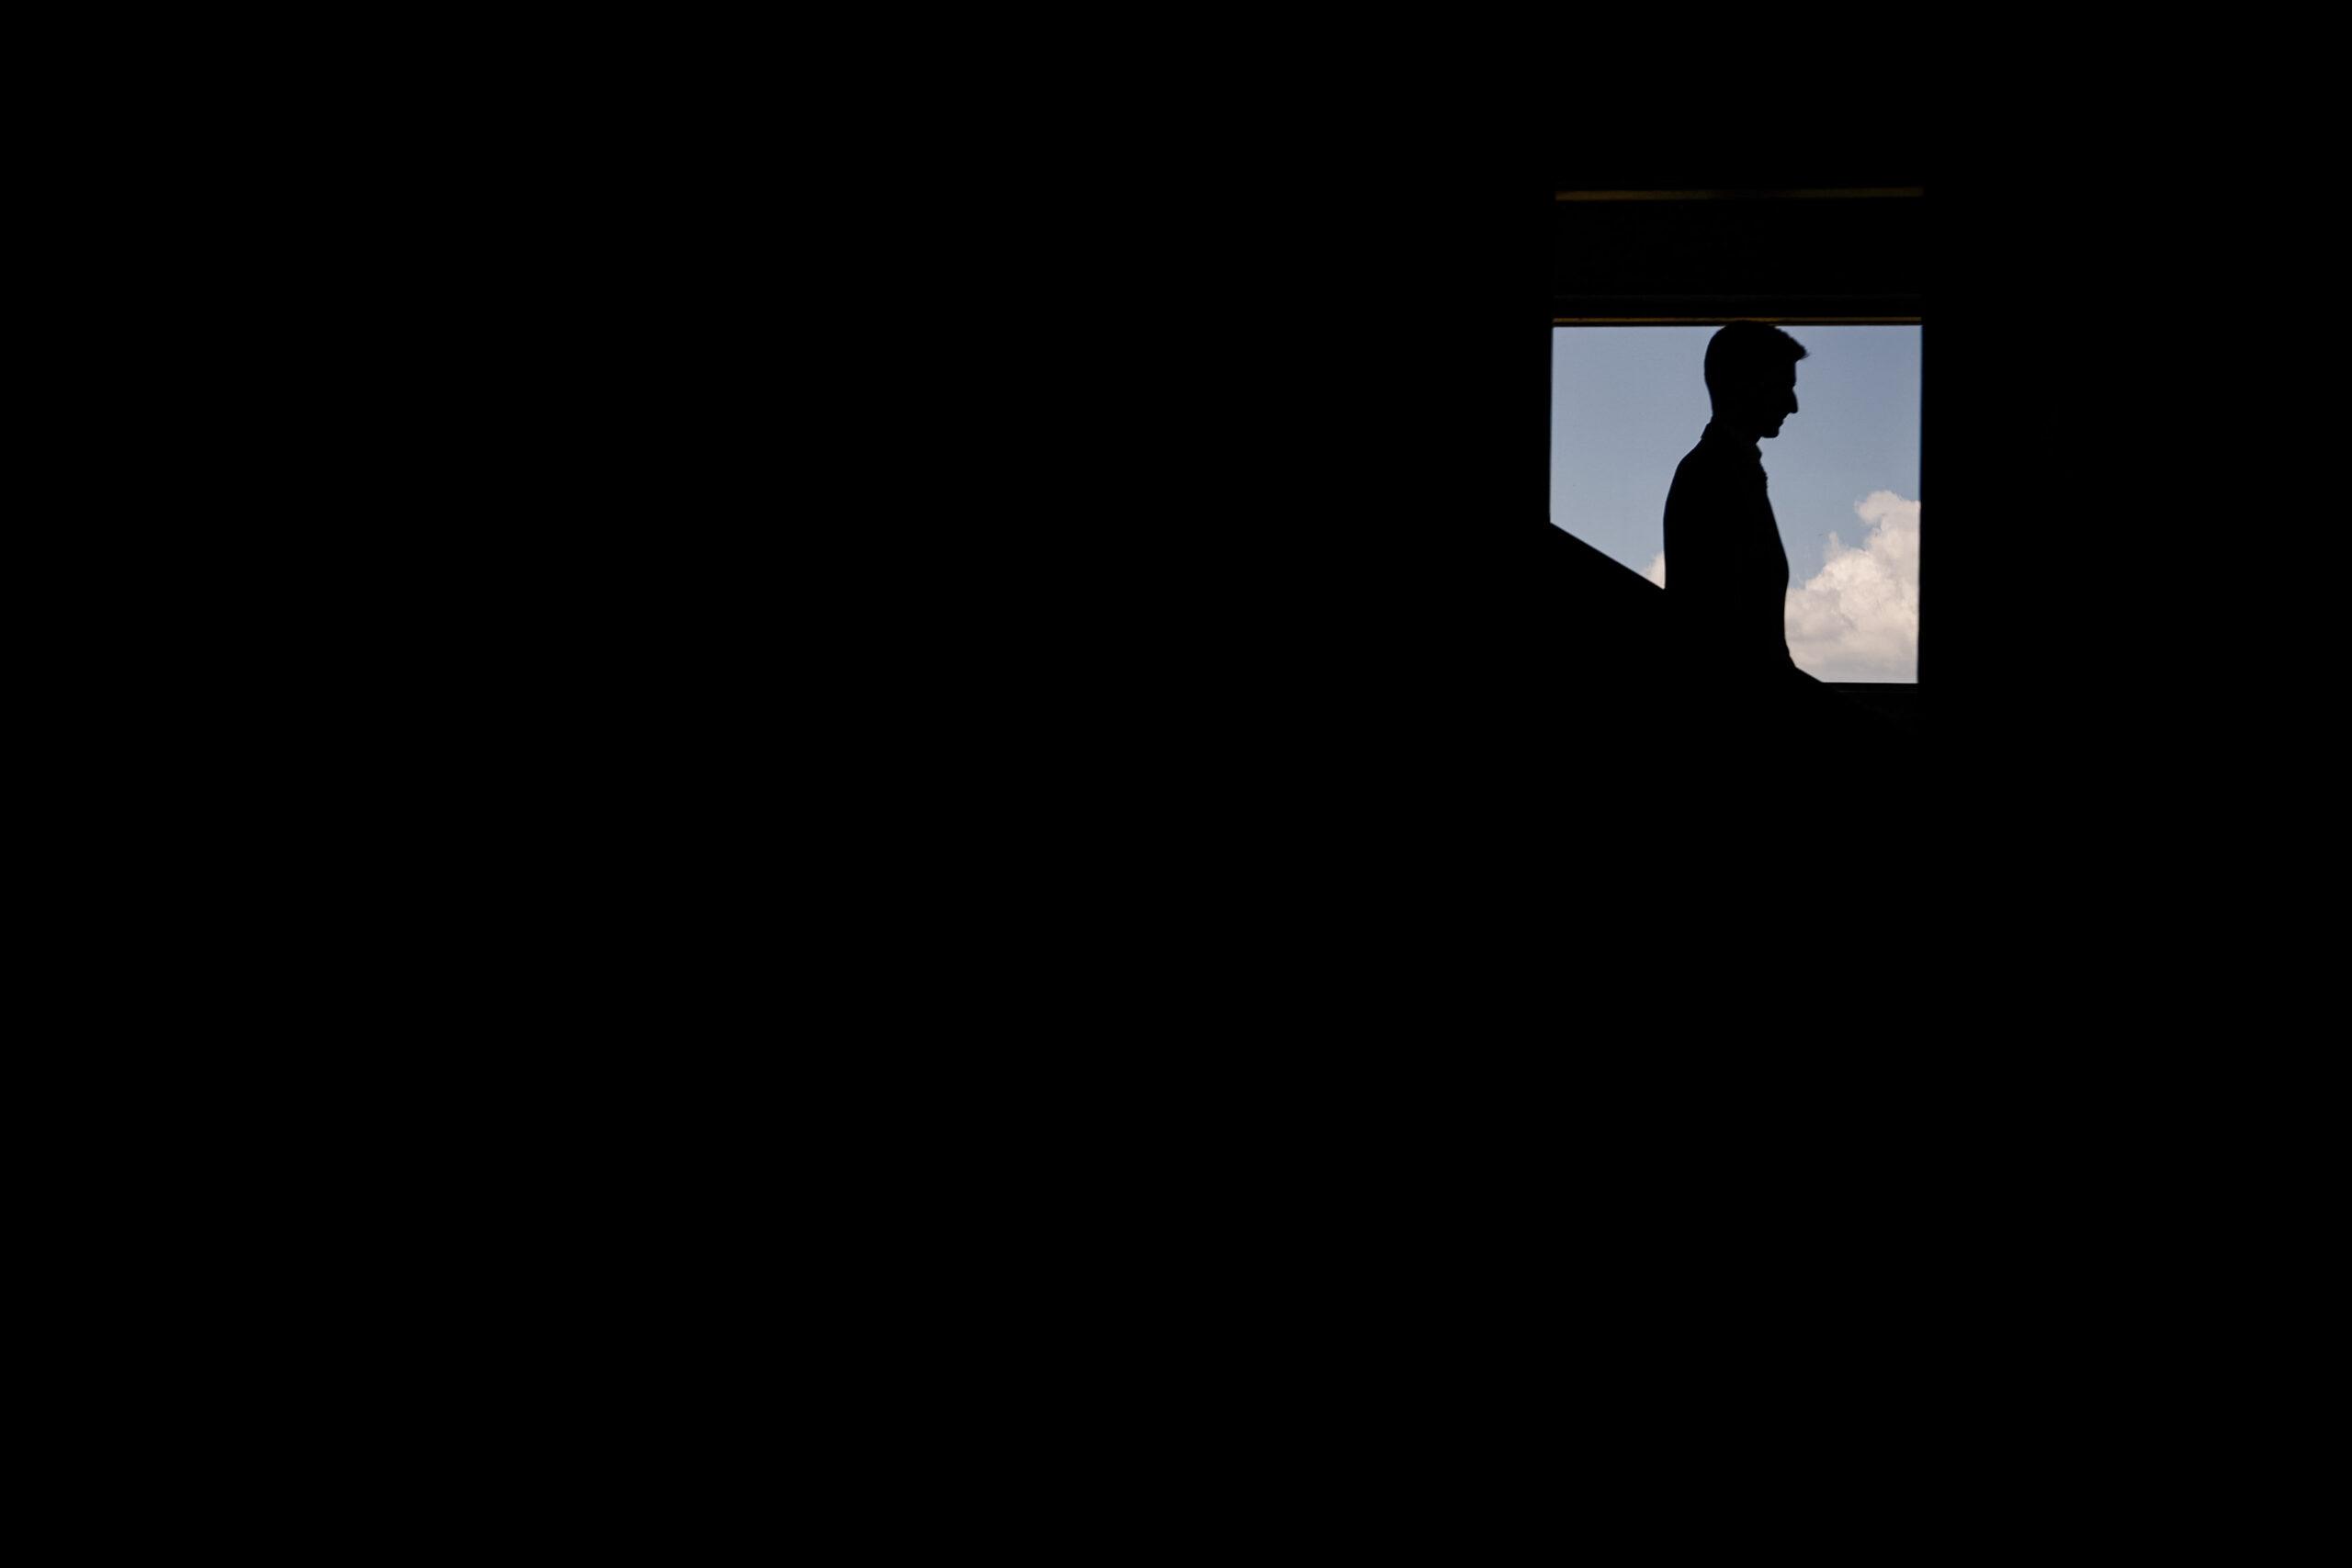 casament camprodon, boda pirineus, el mariner, casament el mariner, casar-se a catalunya, boda, casament, wedding, wedding day, weddin dress, bride, groom, love, happiness, outdoor wedding, outdoor ceremony, love, emotion, real moments, real wedding, decoration, wedding decor, wedding inspiration, wedding planner barcelona, wedding planner spain, wedding planner catalunya, fotograf casaments, fotograf girona, barcelona fotograf casaments,